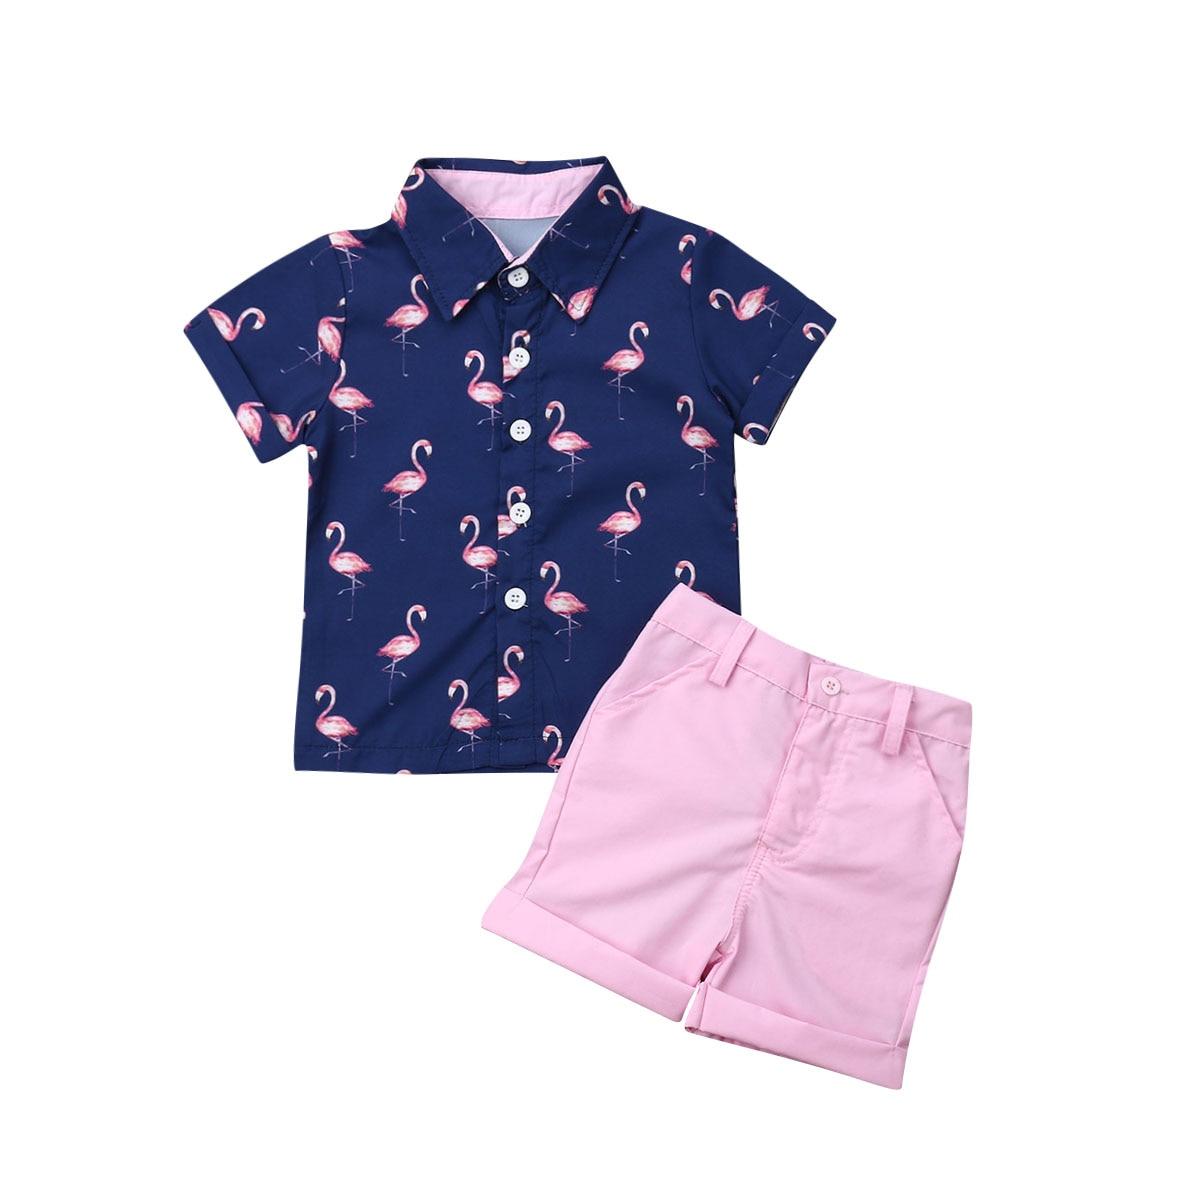 d714036255f9 Pudcoco 2019 Summer Toddler Kid Baby Boy Clothes Outfits Sets Beach  Flamingo Shirt Tops Shorts Pants Set ~ Free Shipping July 2019